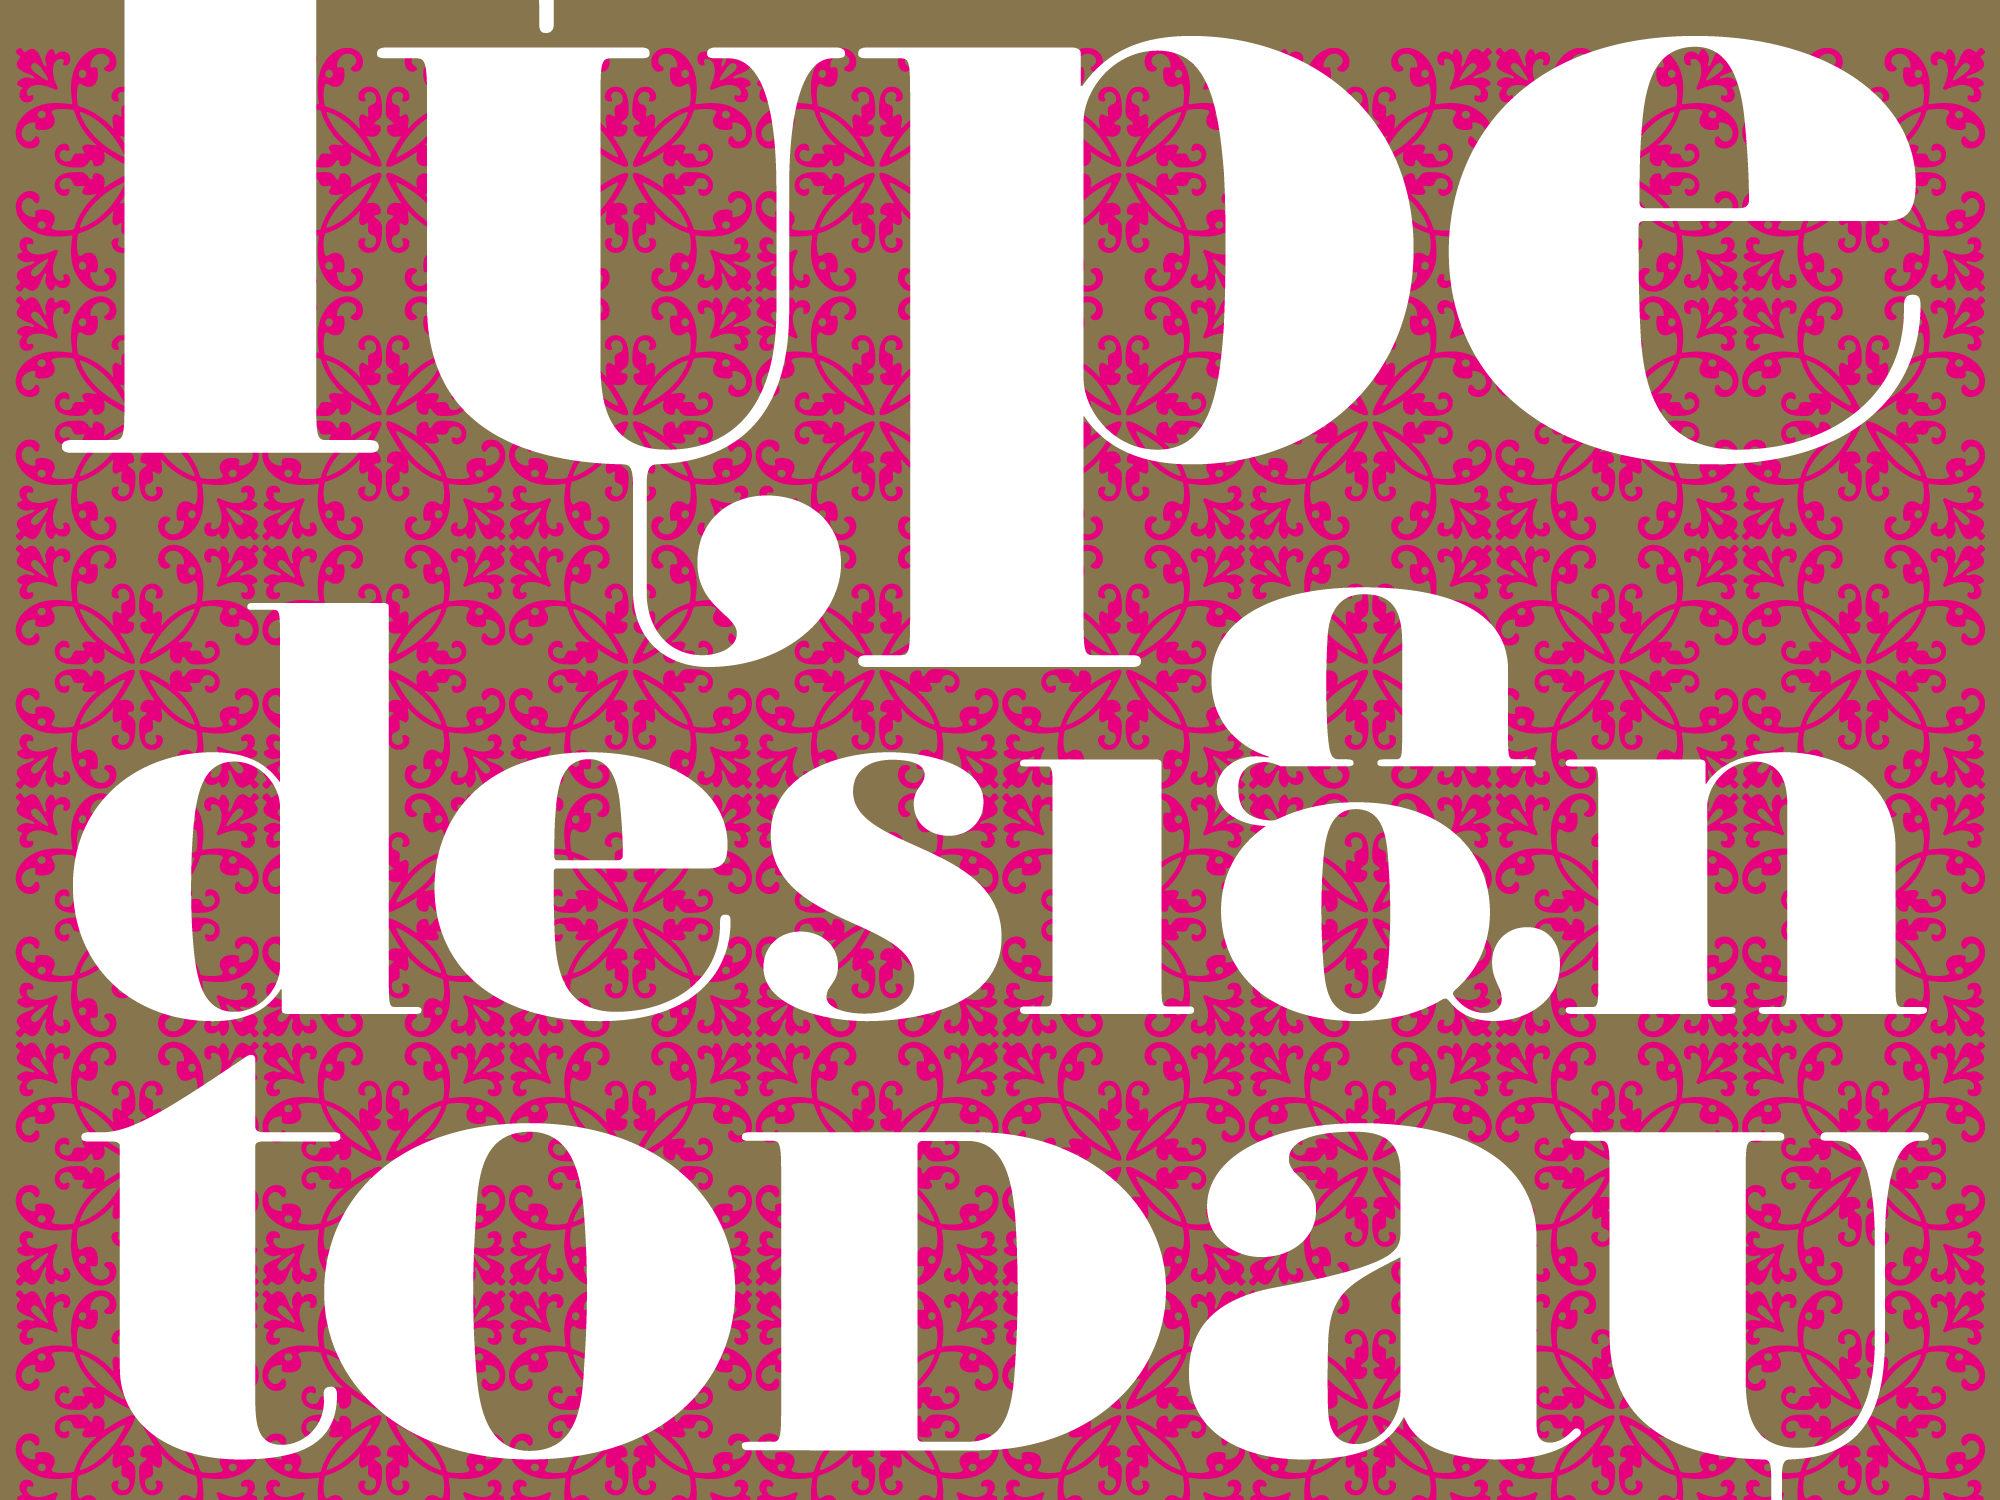 Idea 305: Type design today